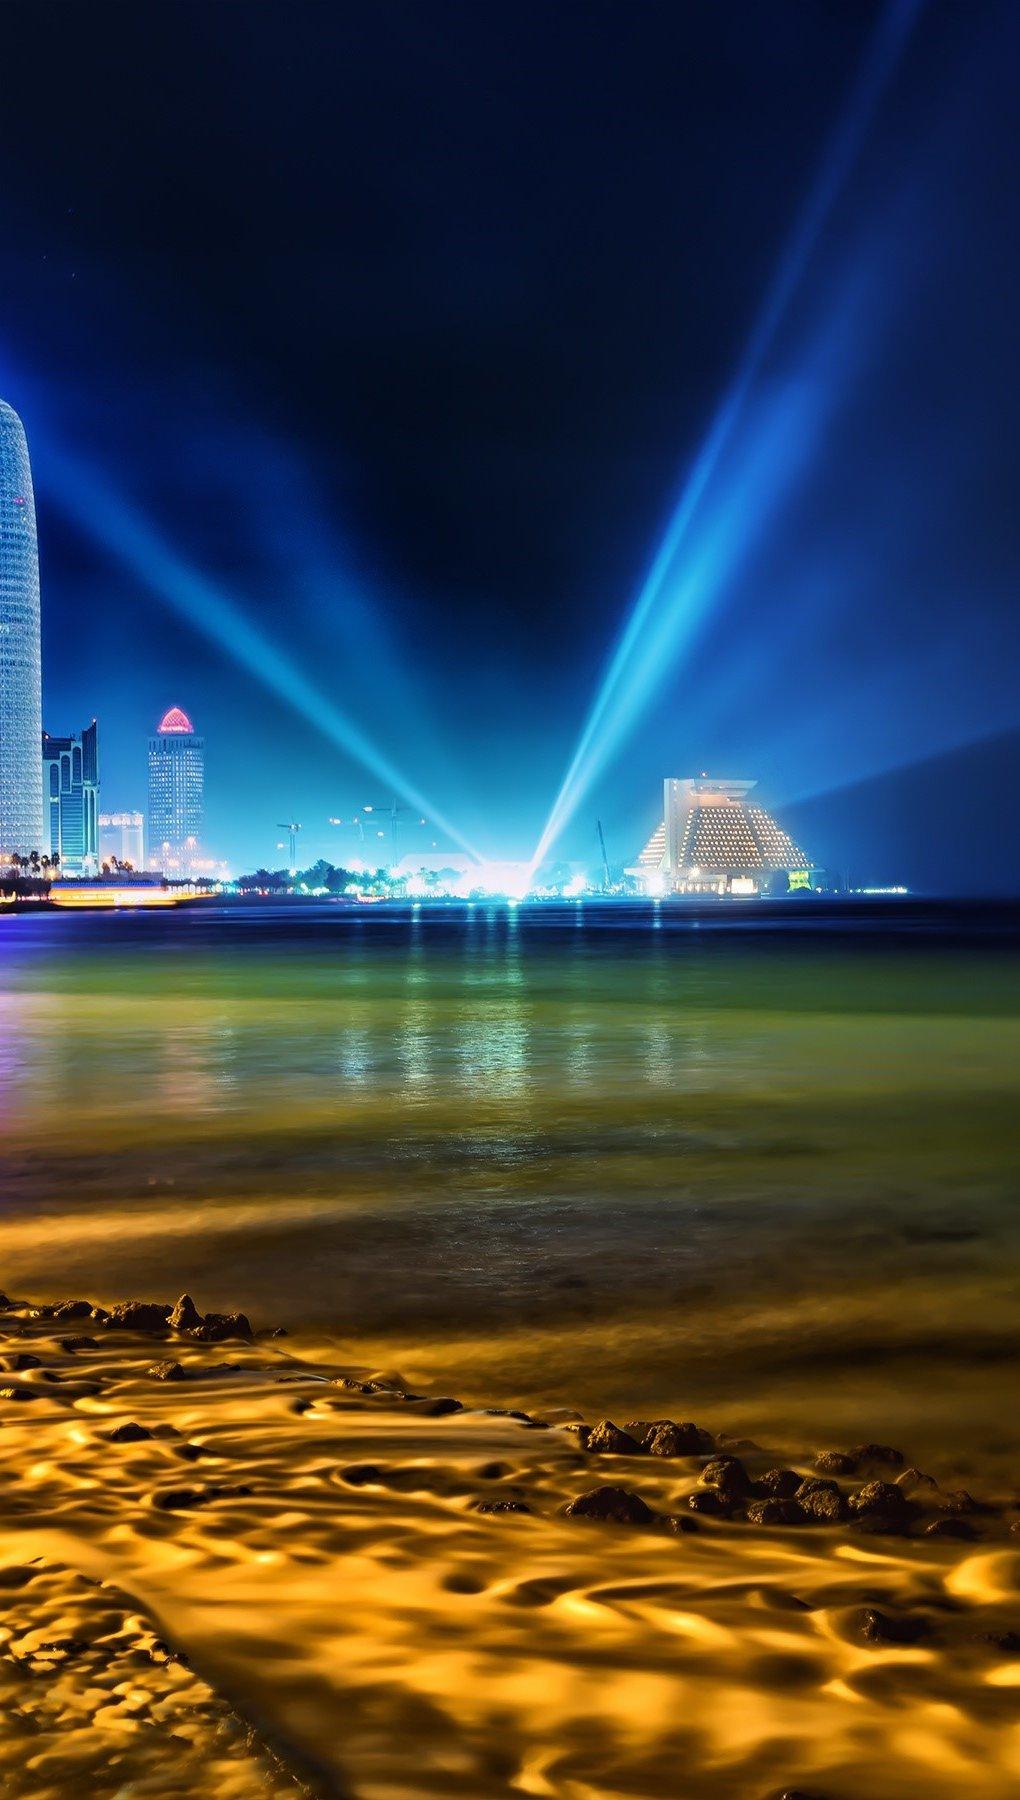 Wallpaper Lights in Doha Qatar Vertical